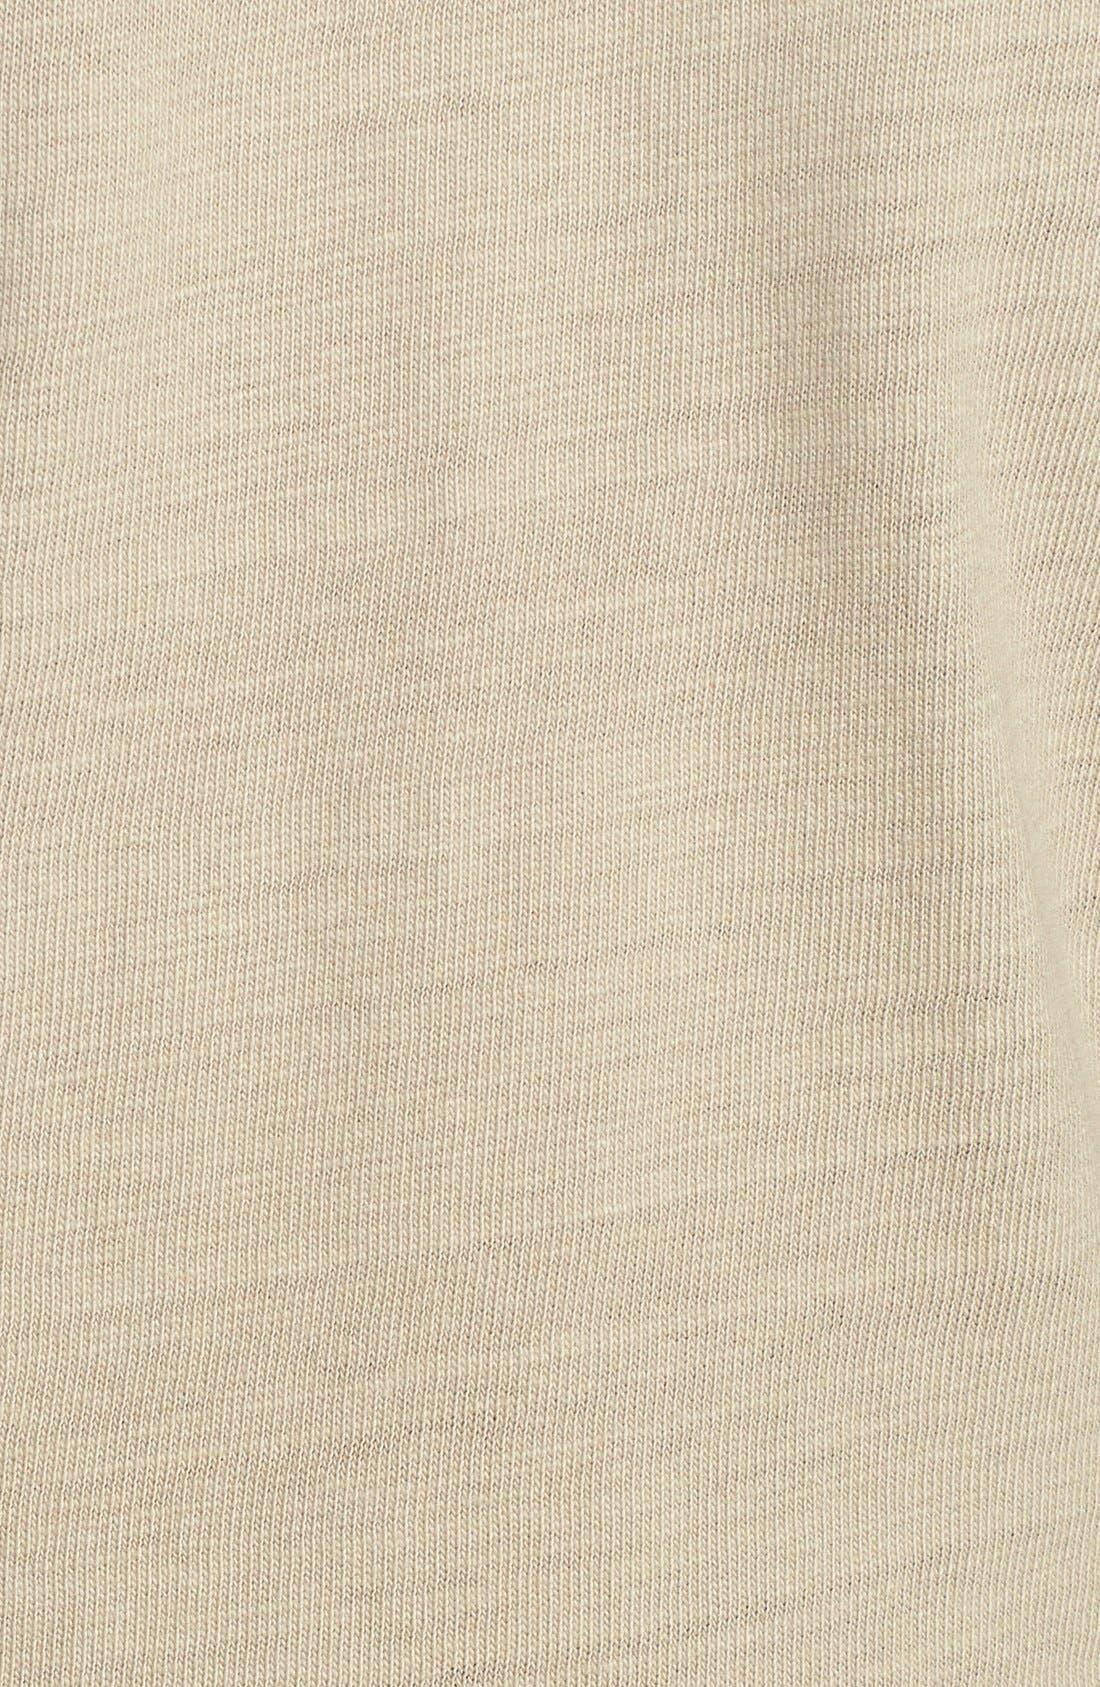 Knit One-Button Blazer,                             Alternate thumbnail 29, color,